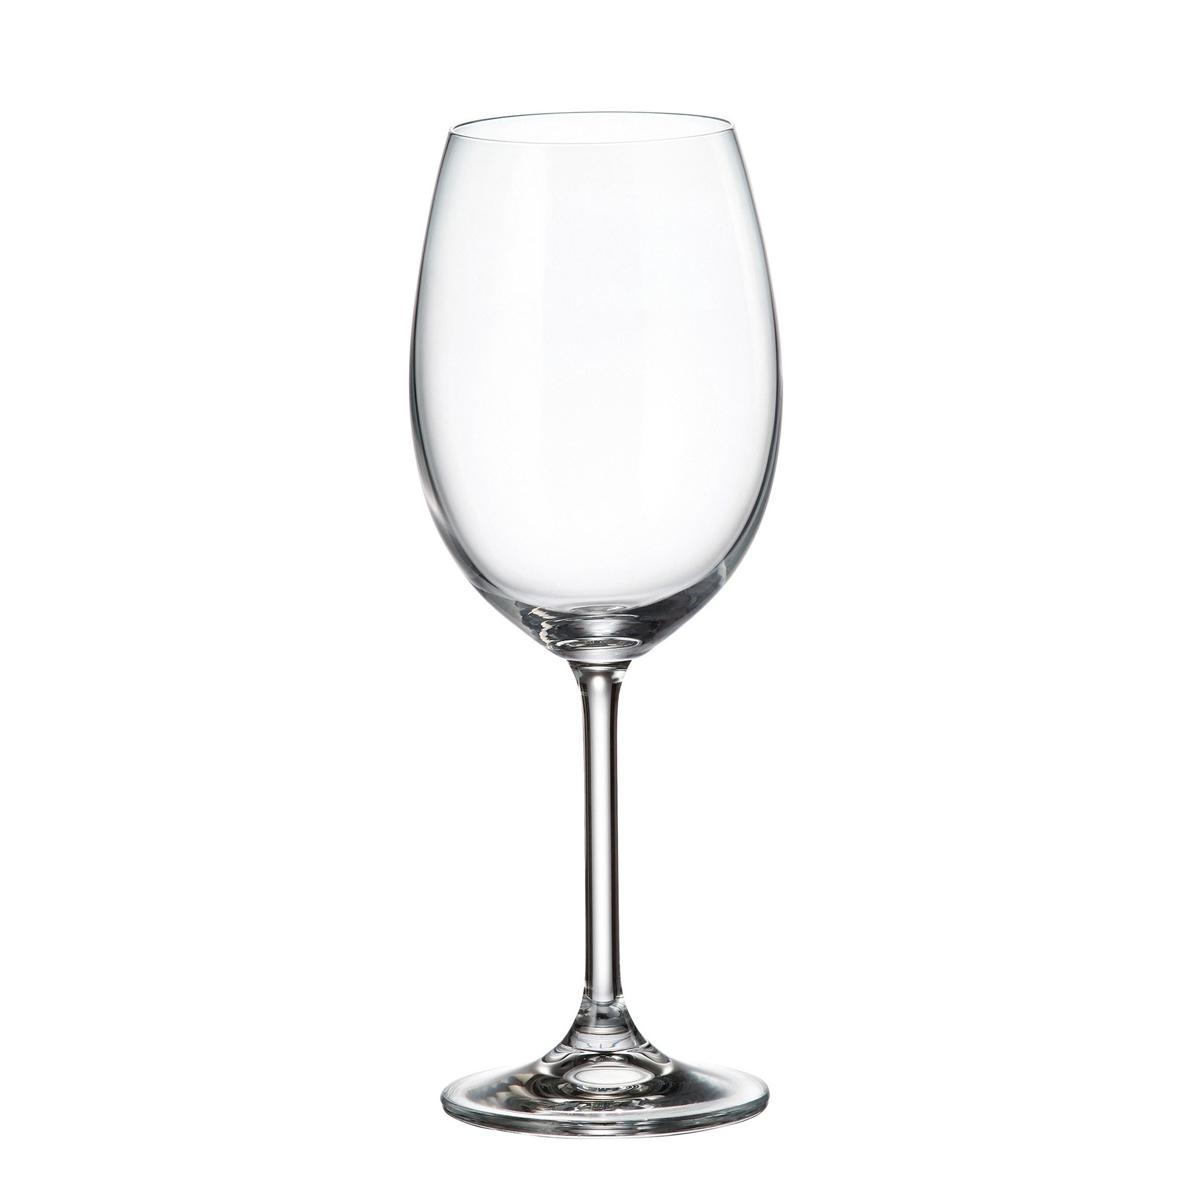 Colibri Set 6 Pahare Cristalin Vin 450 Ml 2021 aranjareamesei.ro